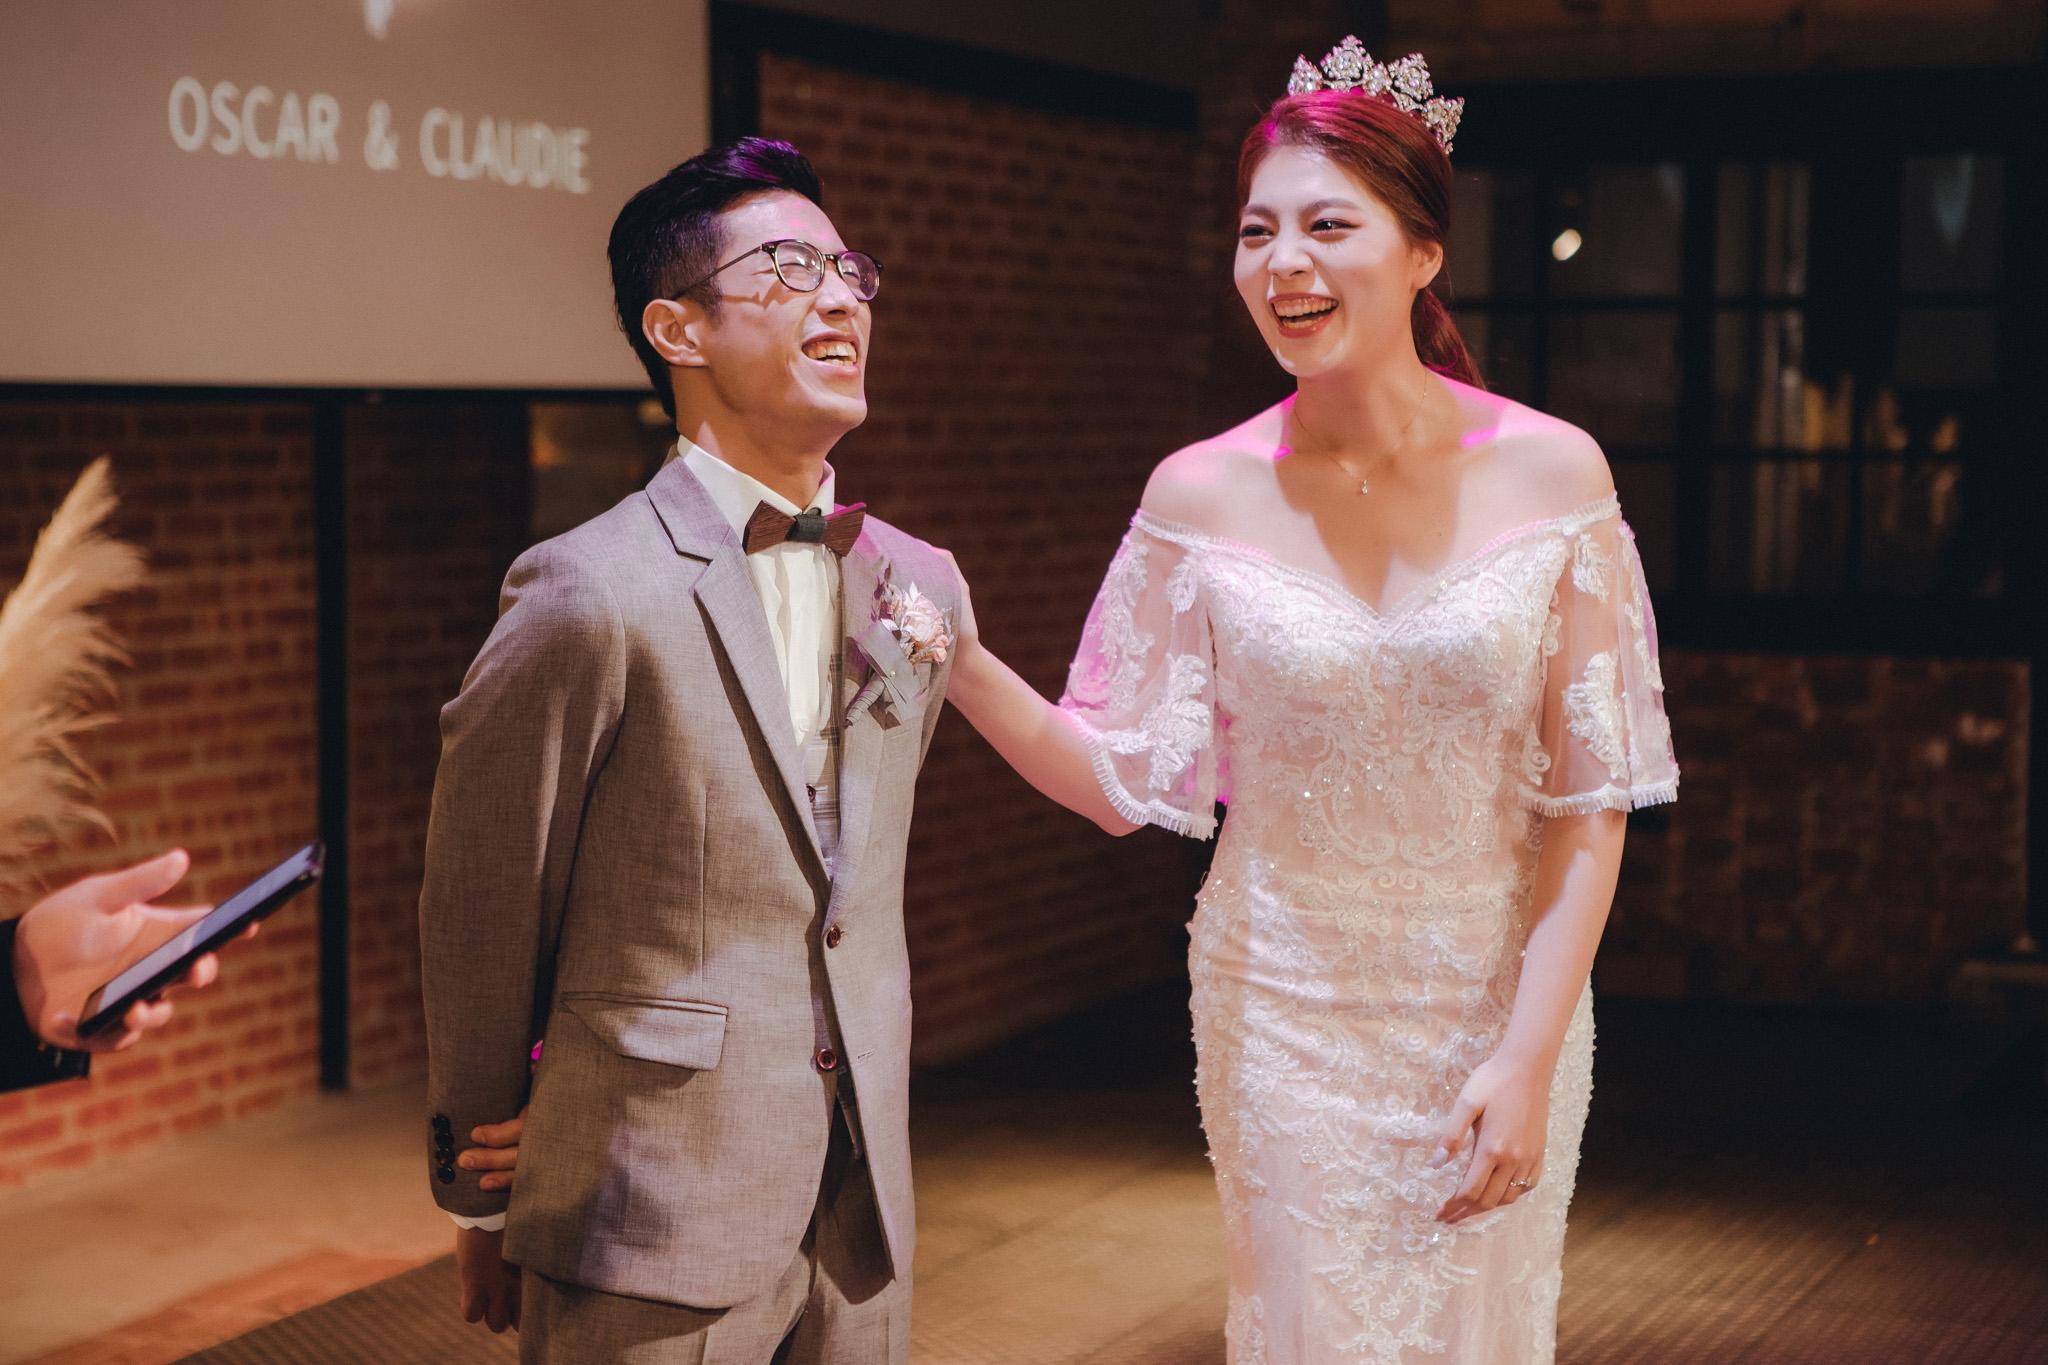 EW 台北婚攝 居米 濟南教會 Brick Yard 33 美軍俱樂部 婚禮 婚宴-109